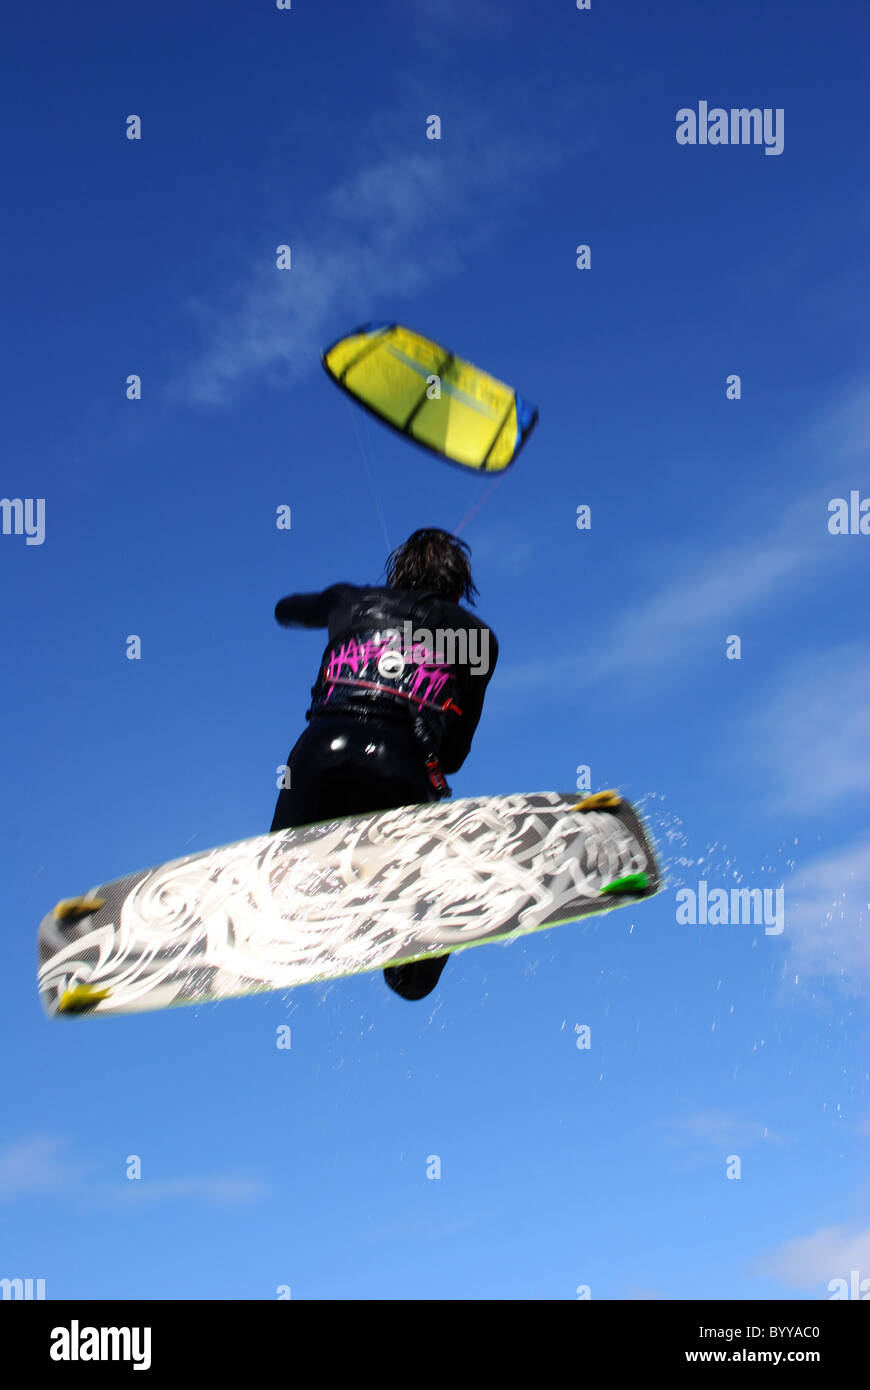 Extreme sport Kitesurfing in Clacton-on-Sea - Stock Image